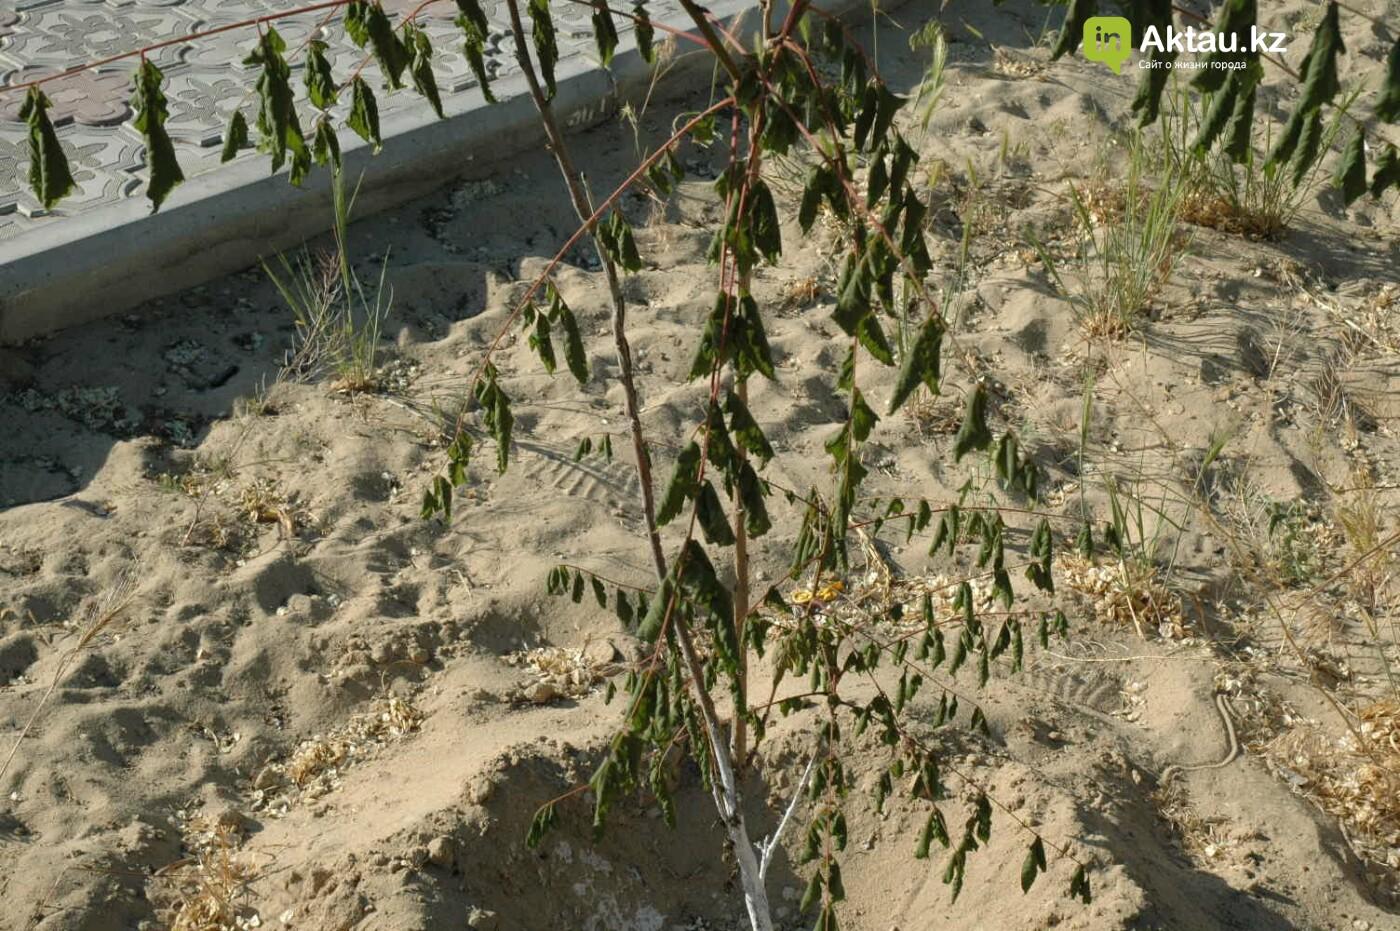 Погибшие от засухи и обезвоживания в Актау исчисляются десятками (ФОТО), фото-1